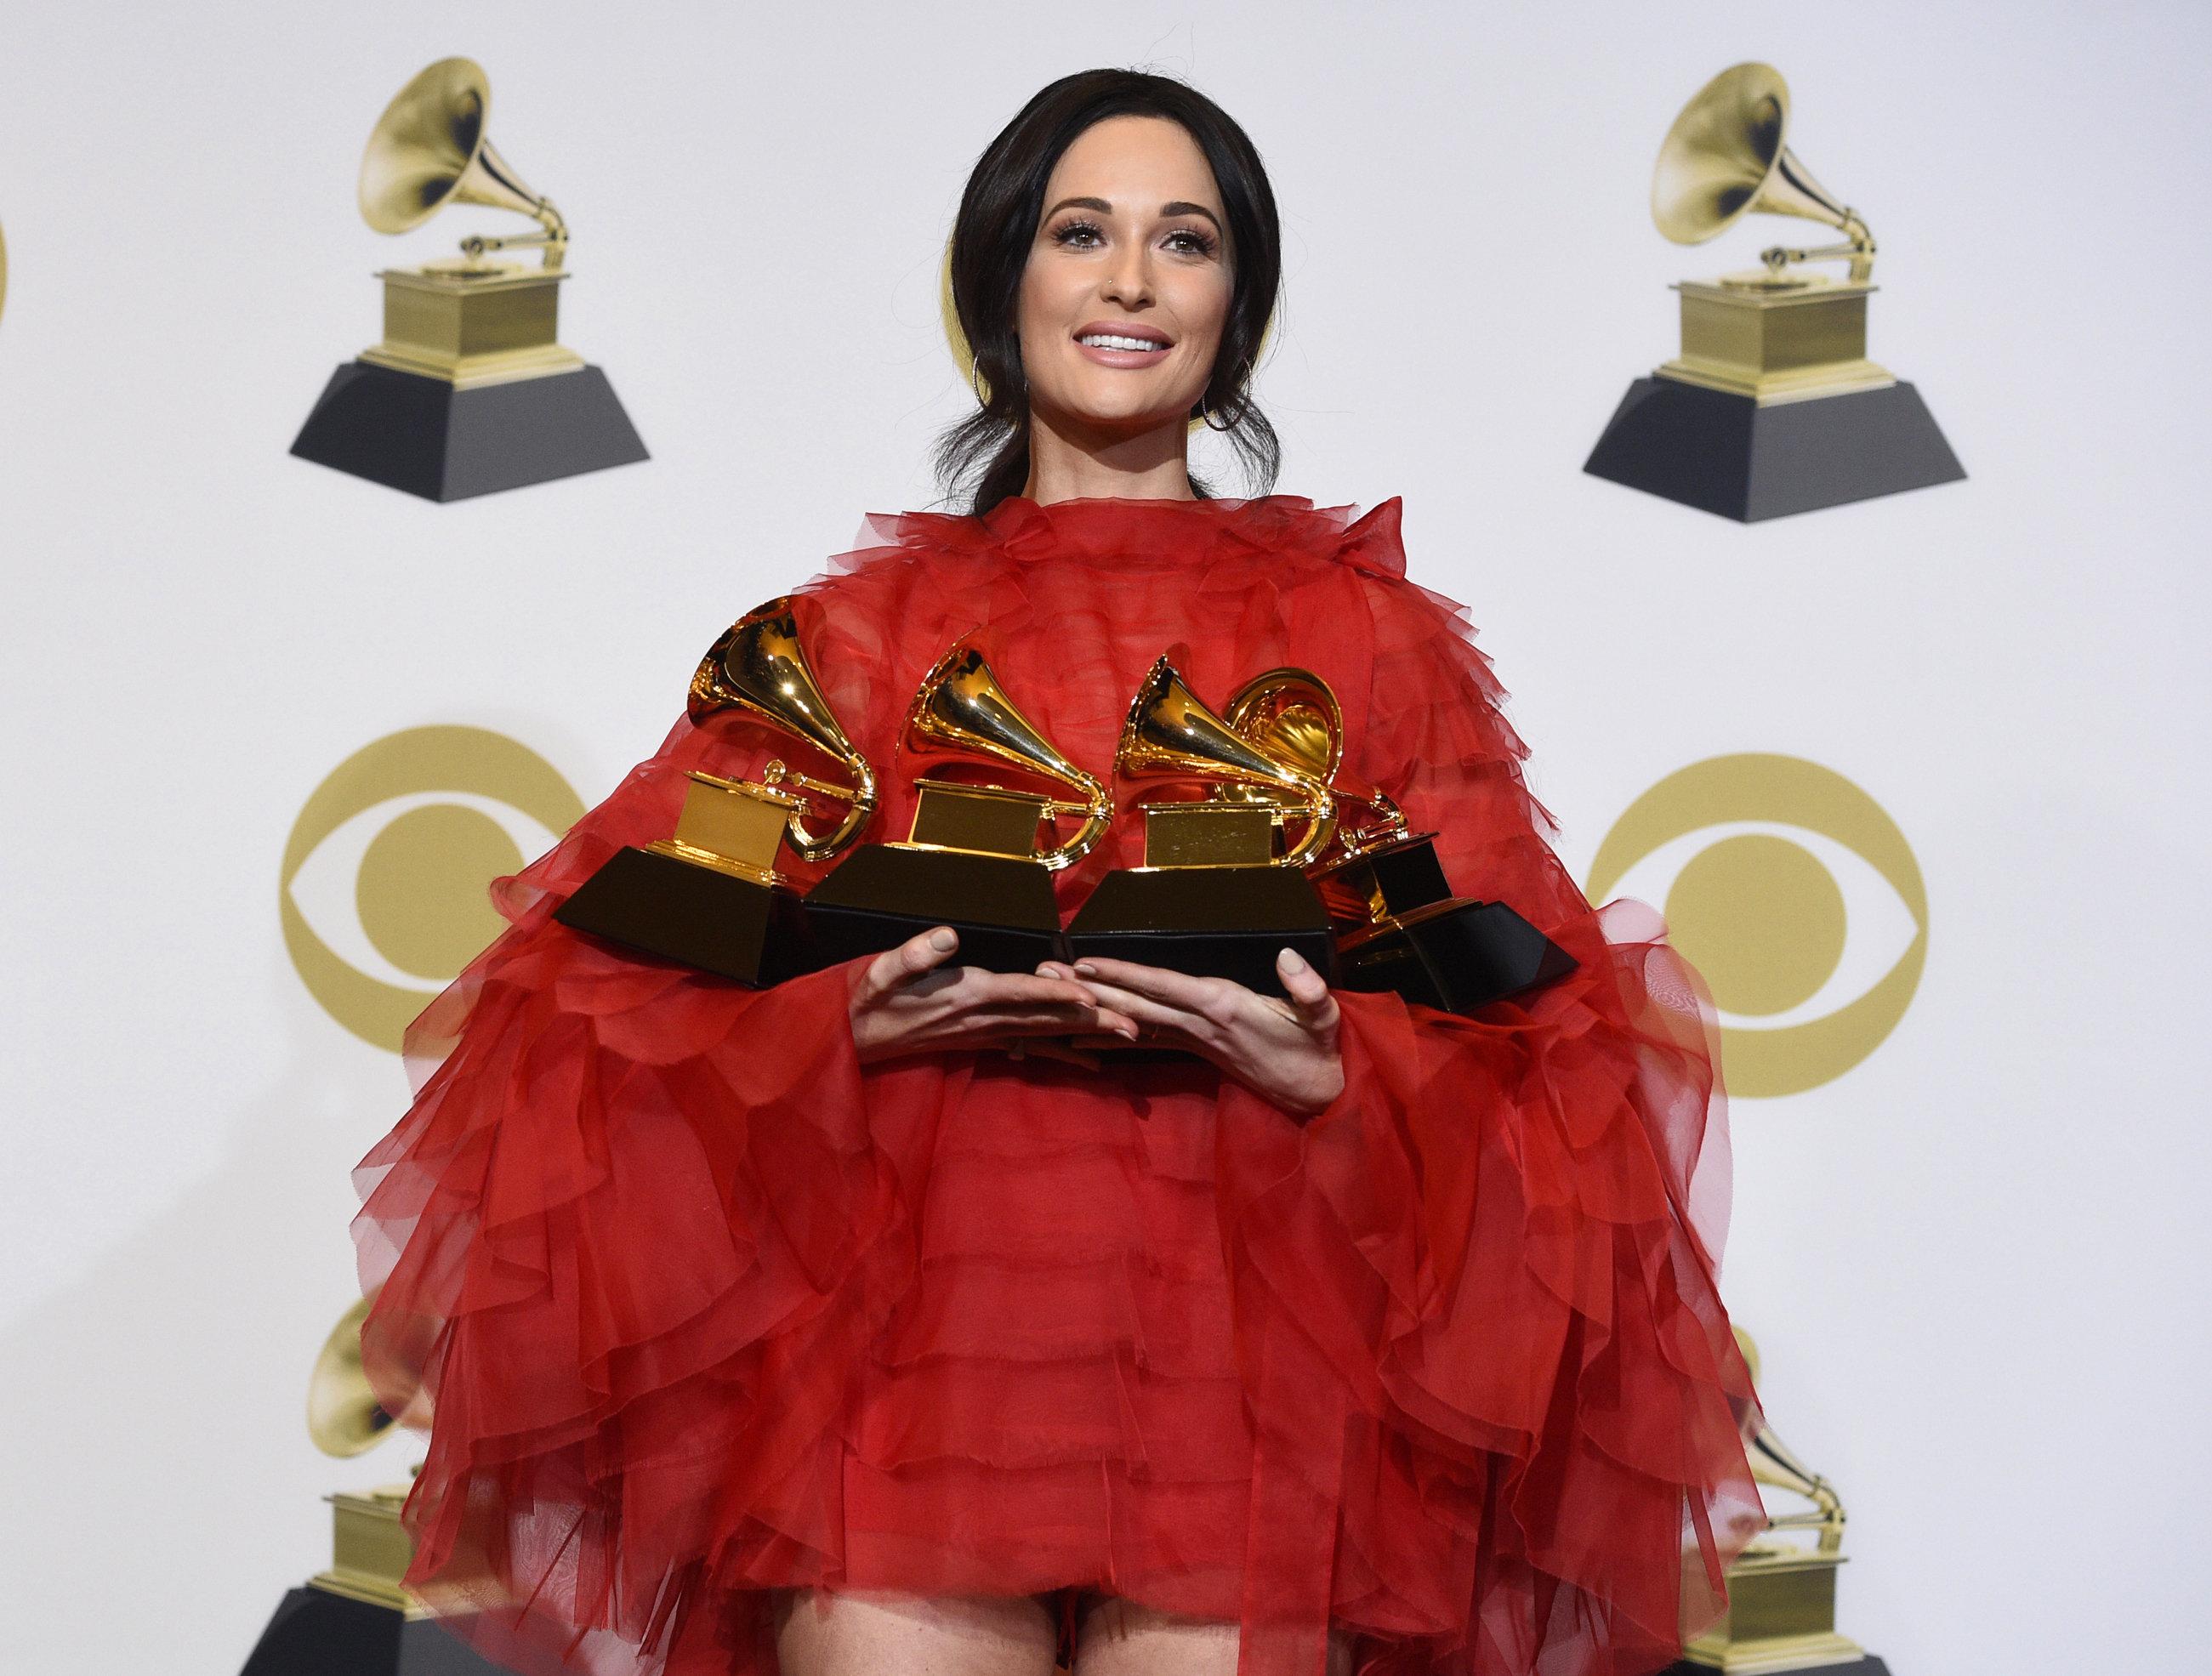 Grammy Awards 2019: qui est Kacey Musgraves, gagnante